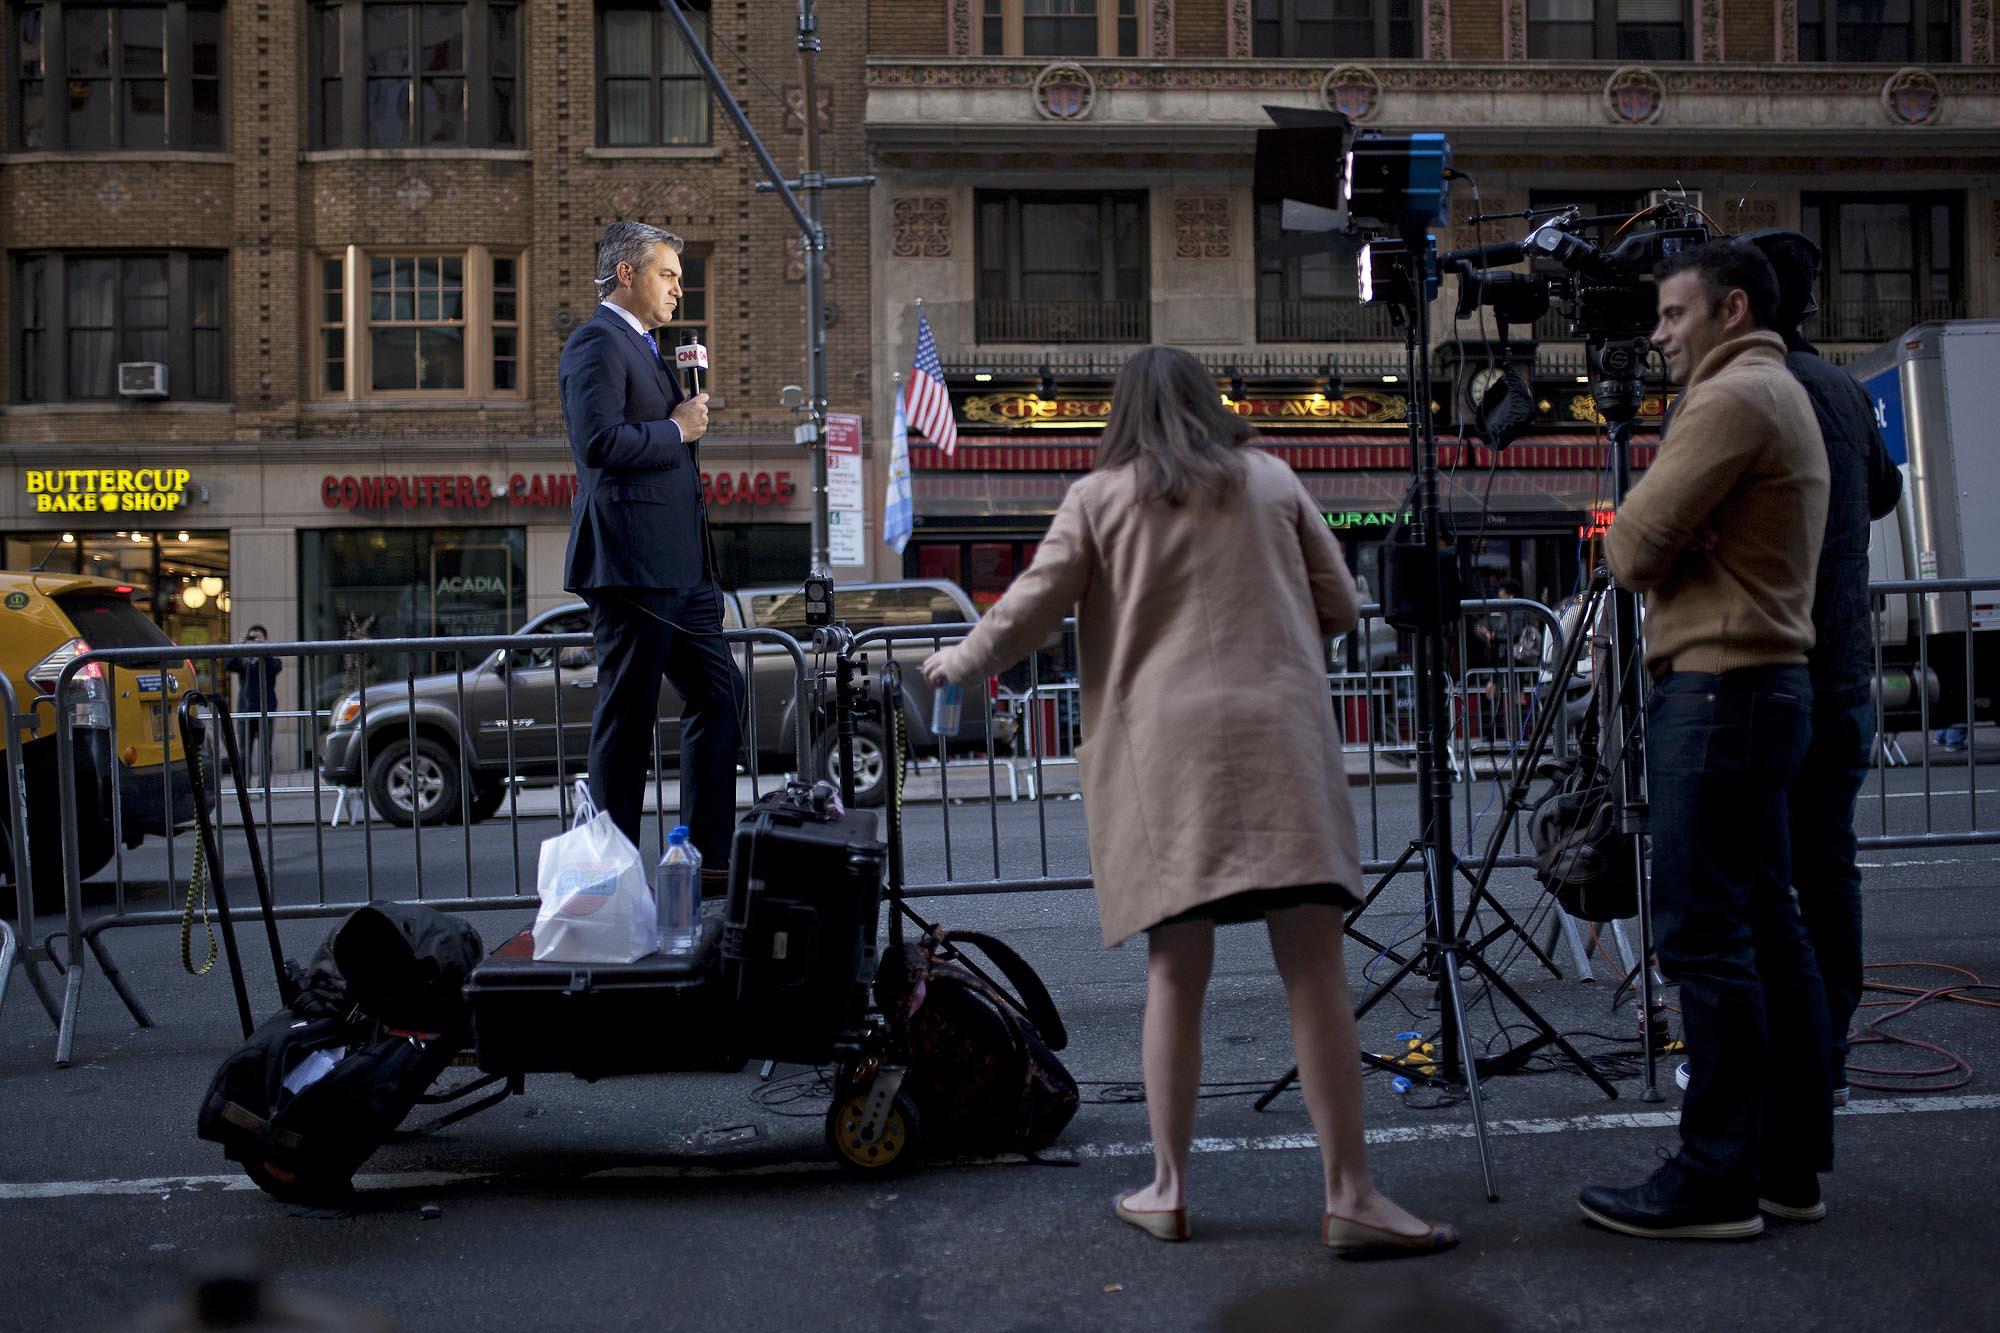 11.08.16: CNN's Jim Acosta Reporting From Trump's Last Presidential Meeting in Midtown Manhattan.